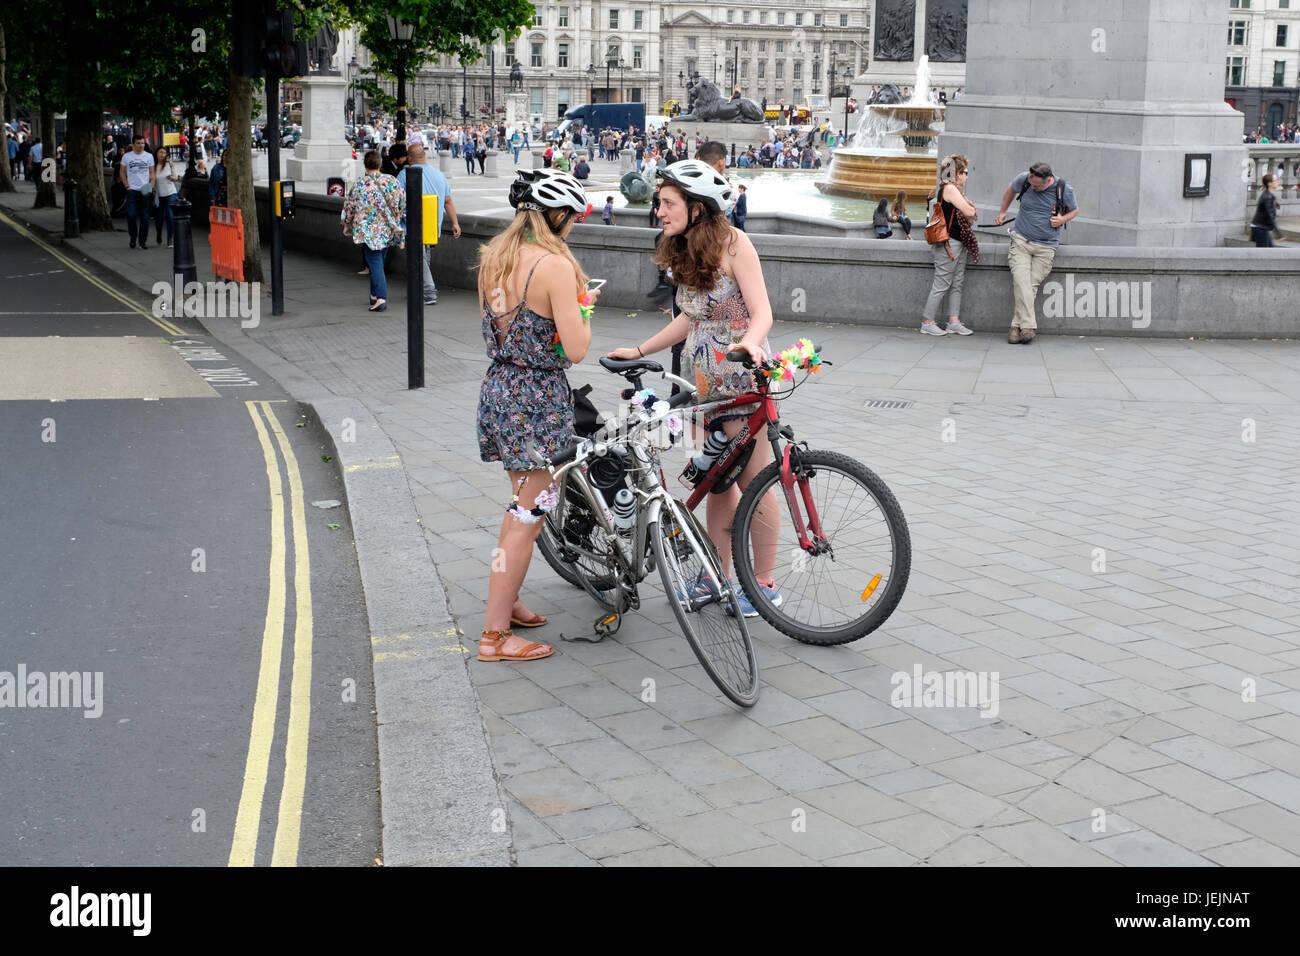 Bicyclists near Trafalgar Square - Stock Image